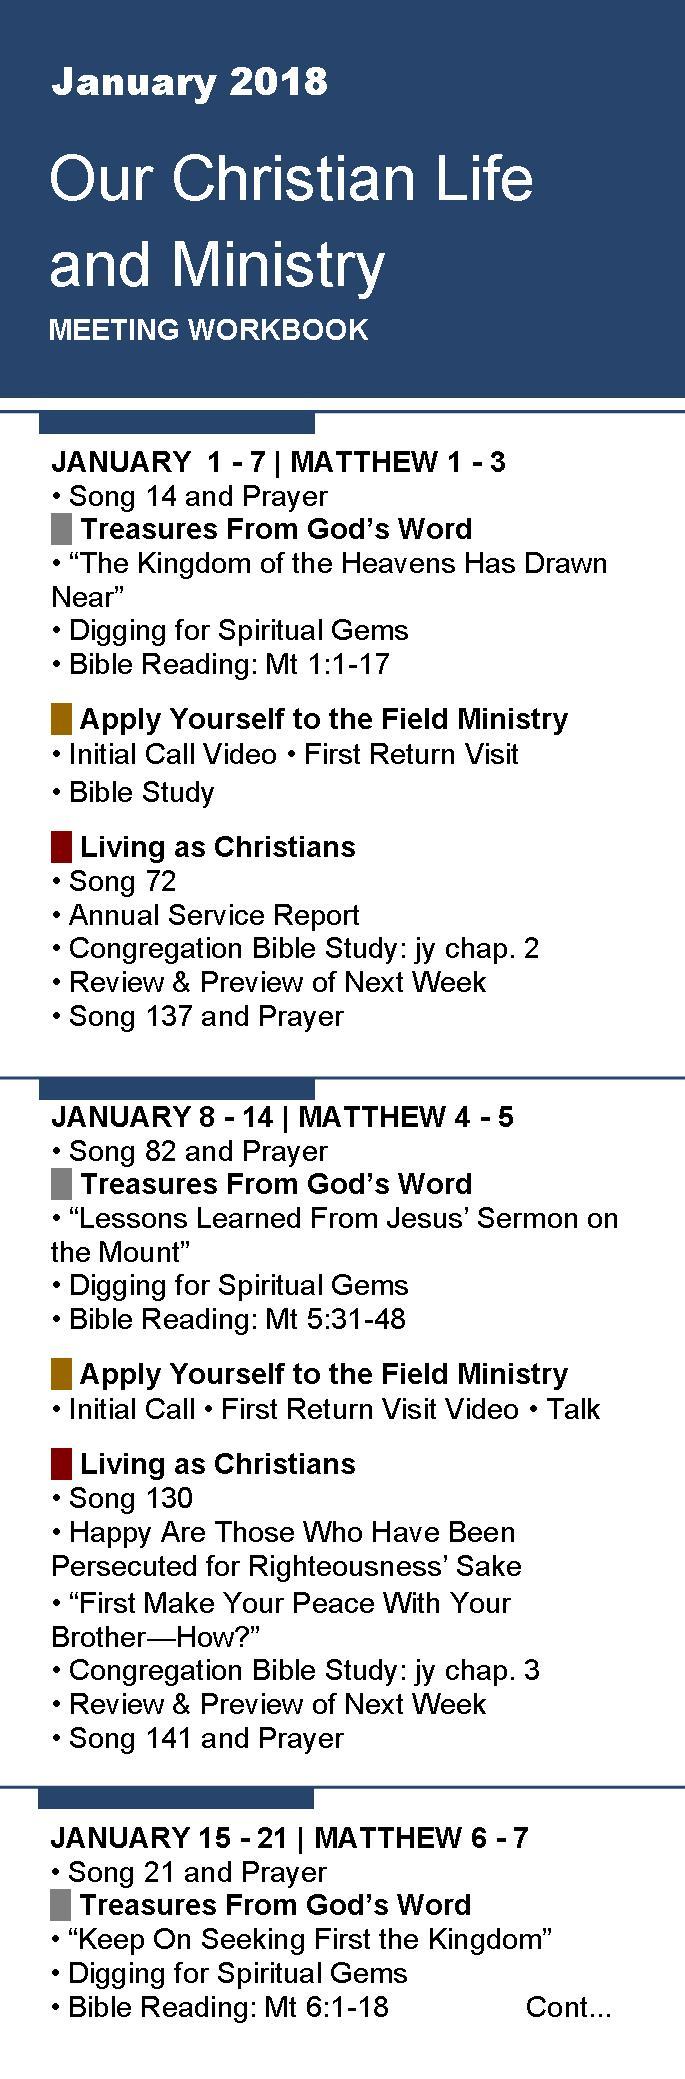 Workbooks prayer workbook : Free Bookmarks for Meeting Workbook January 2018 - Articoli per ...